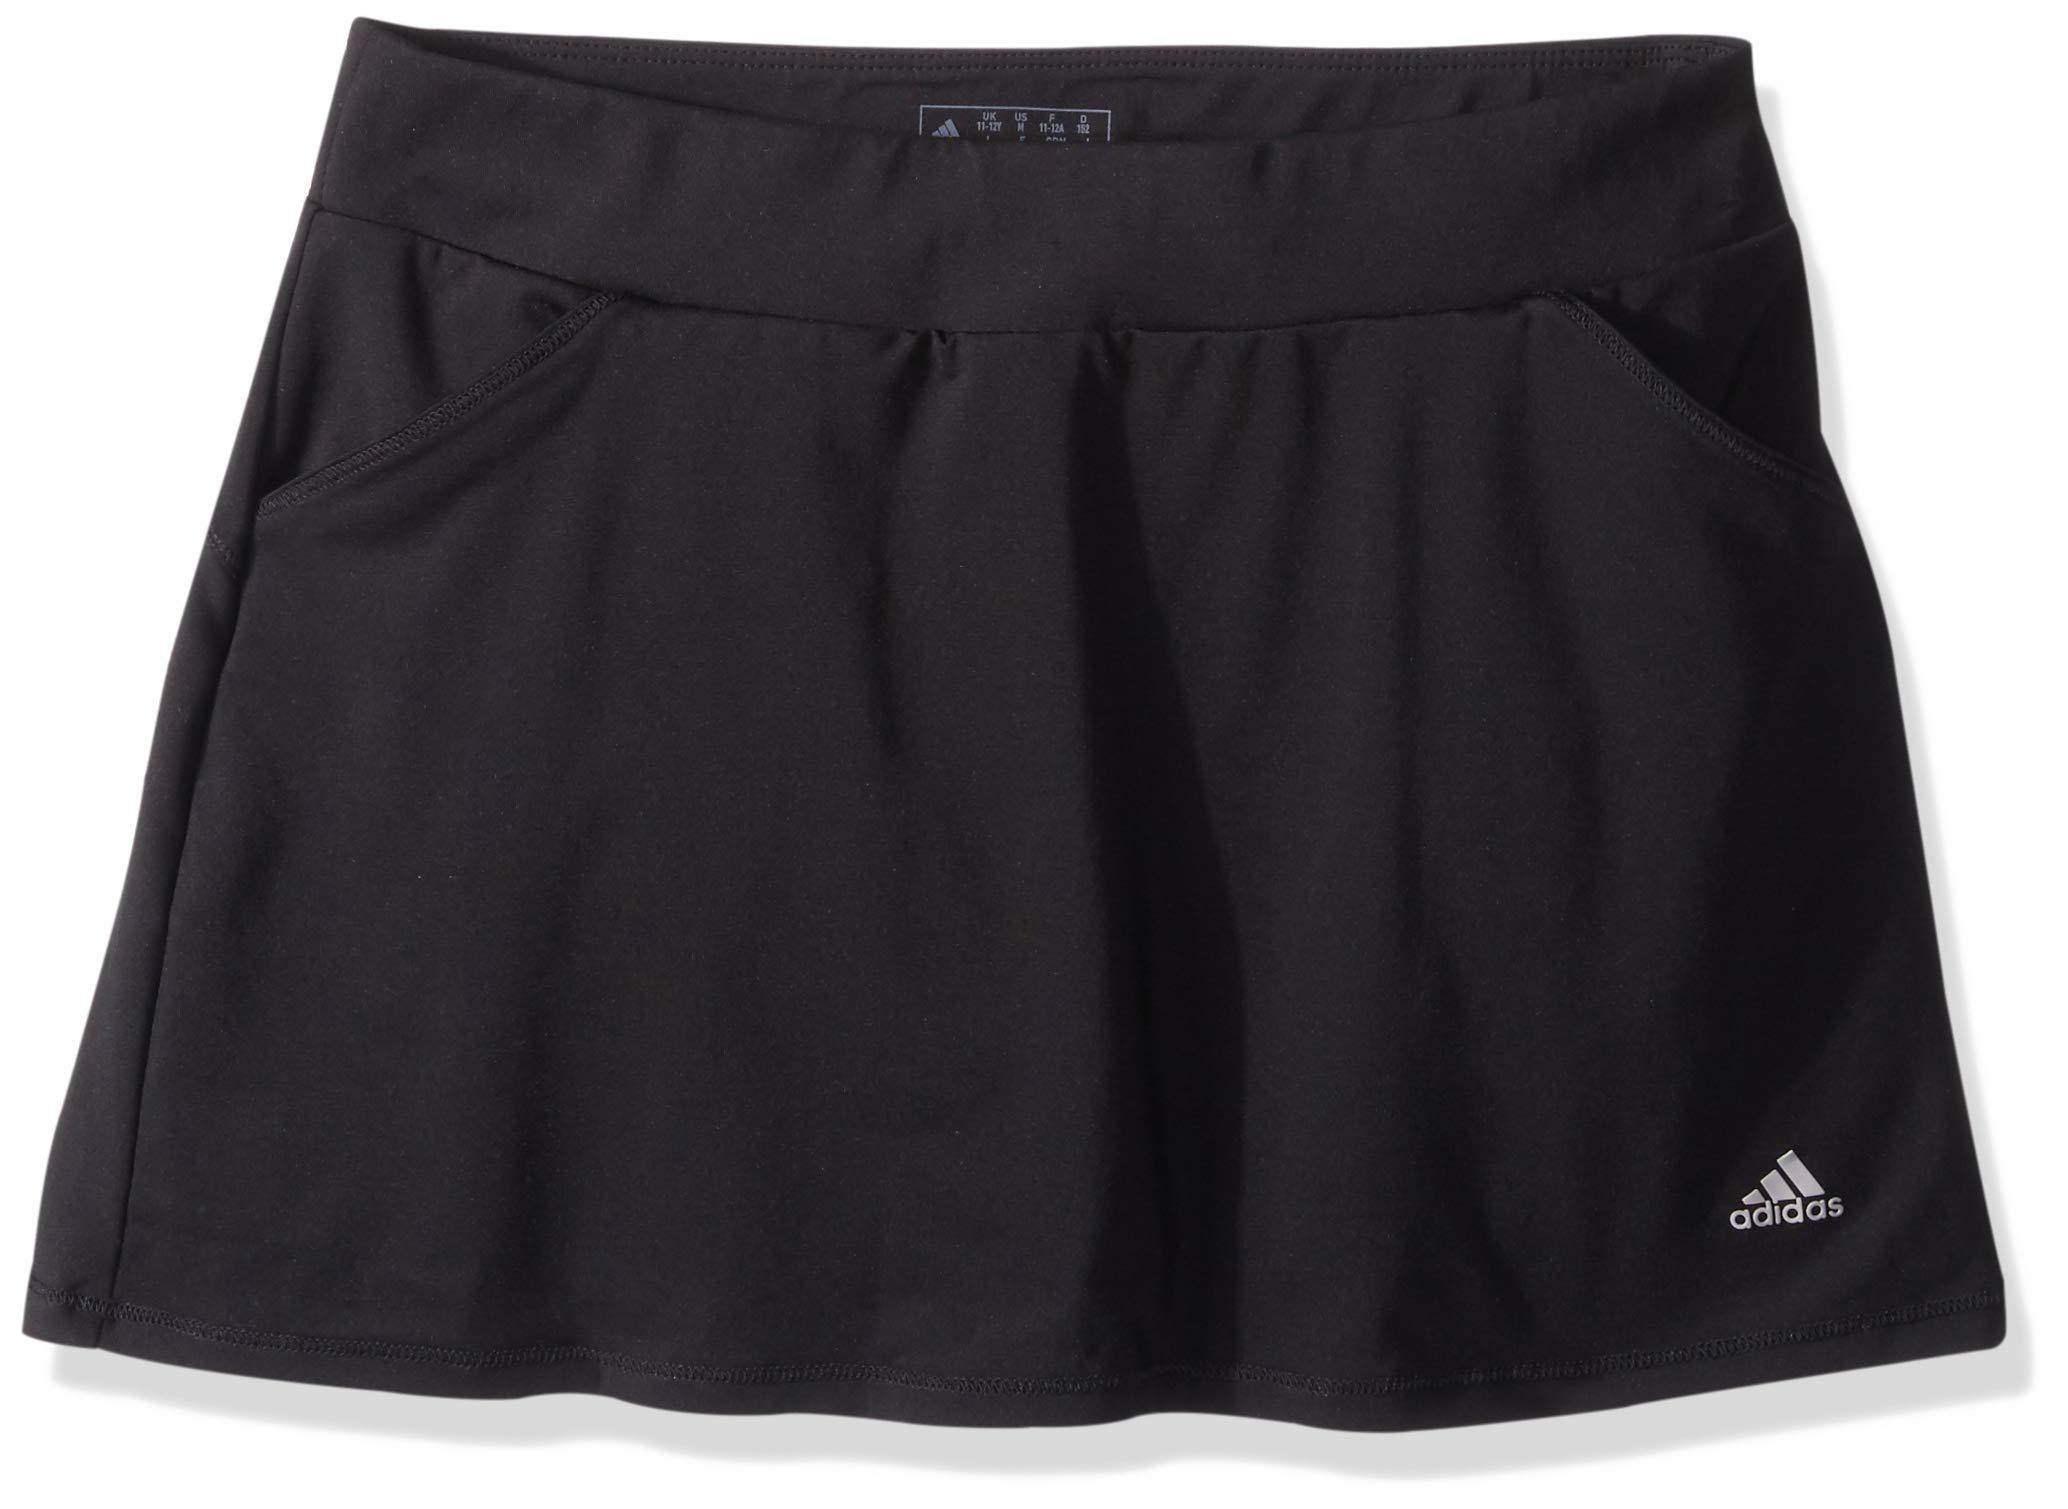 adidas Golf Printed Golf Skort, Black, Medium by adidas